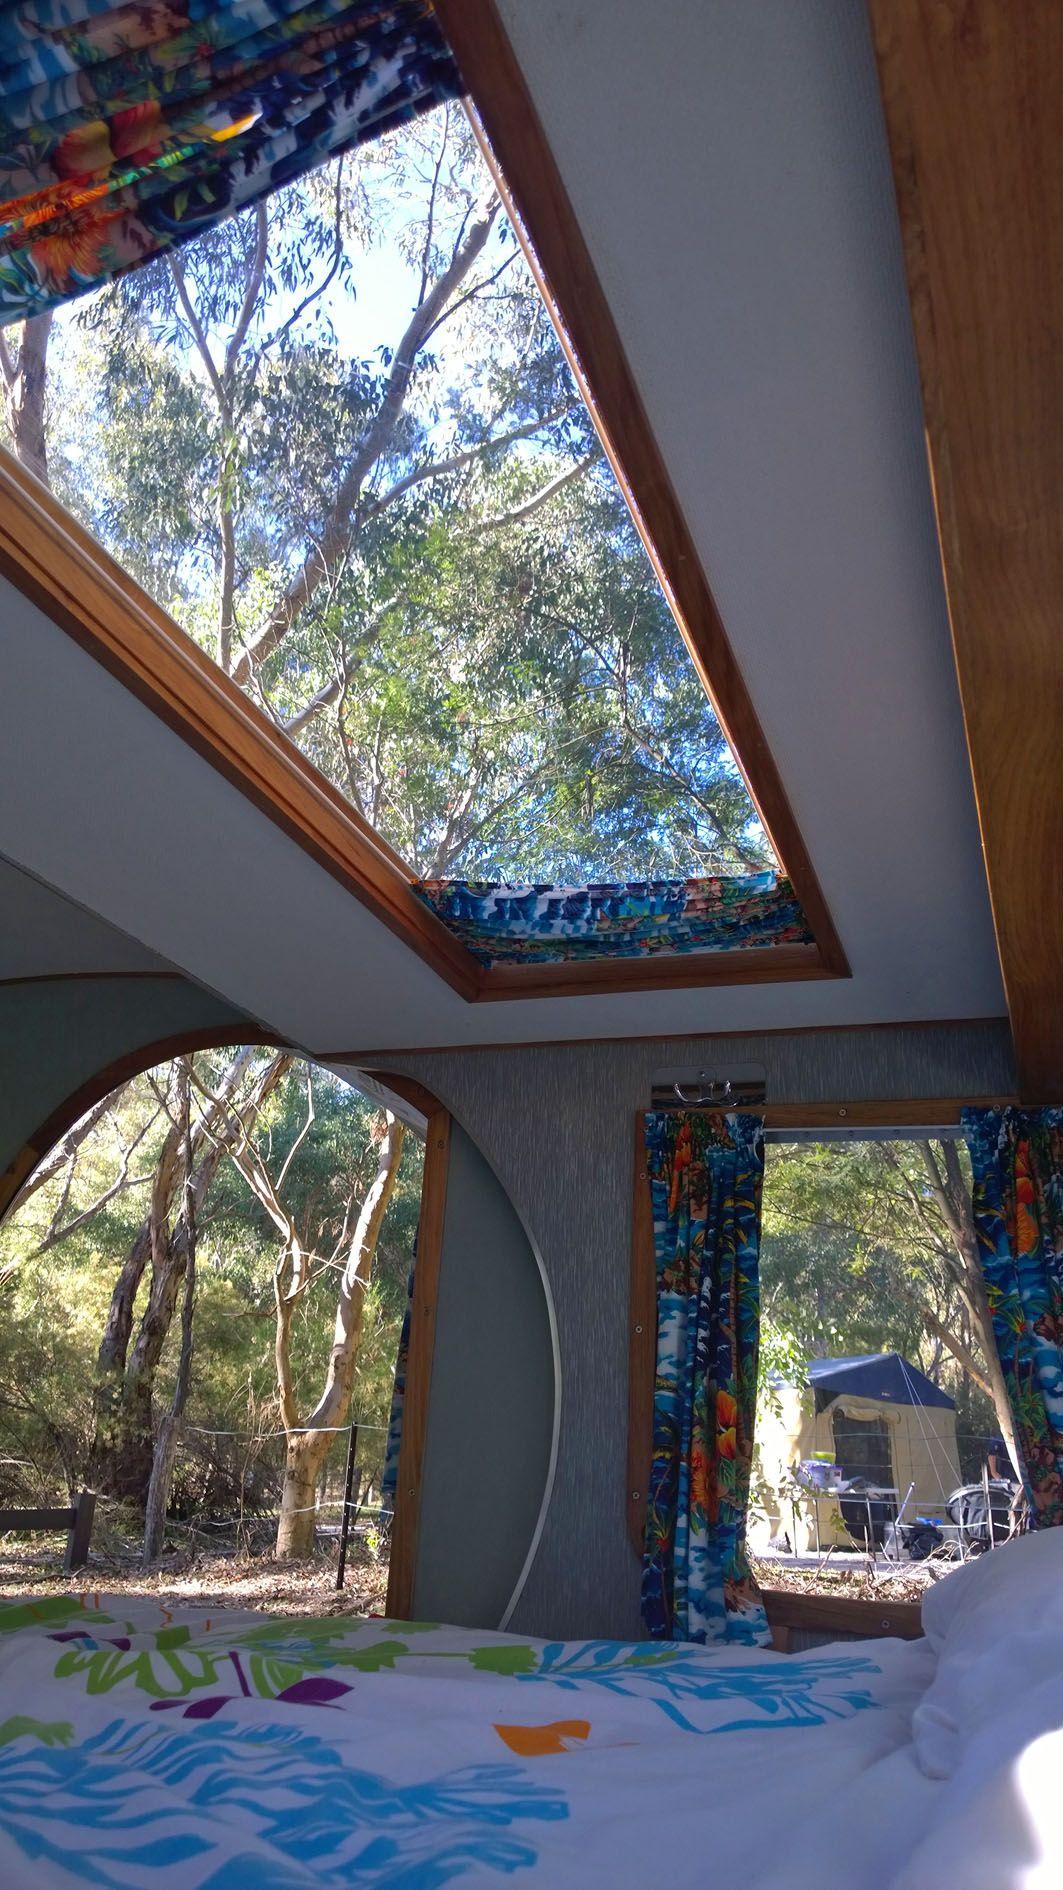 Girraween National Park Great Outdoors Teardrop Camper